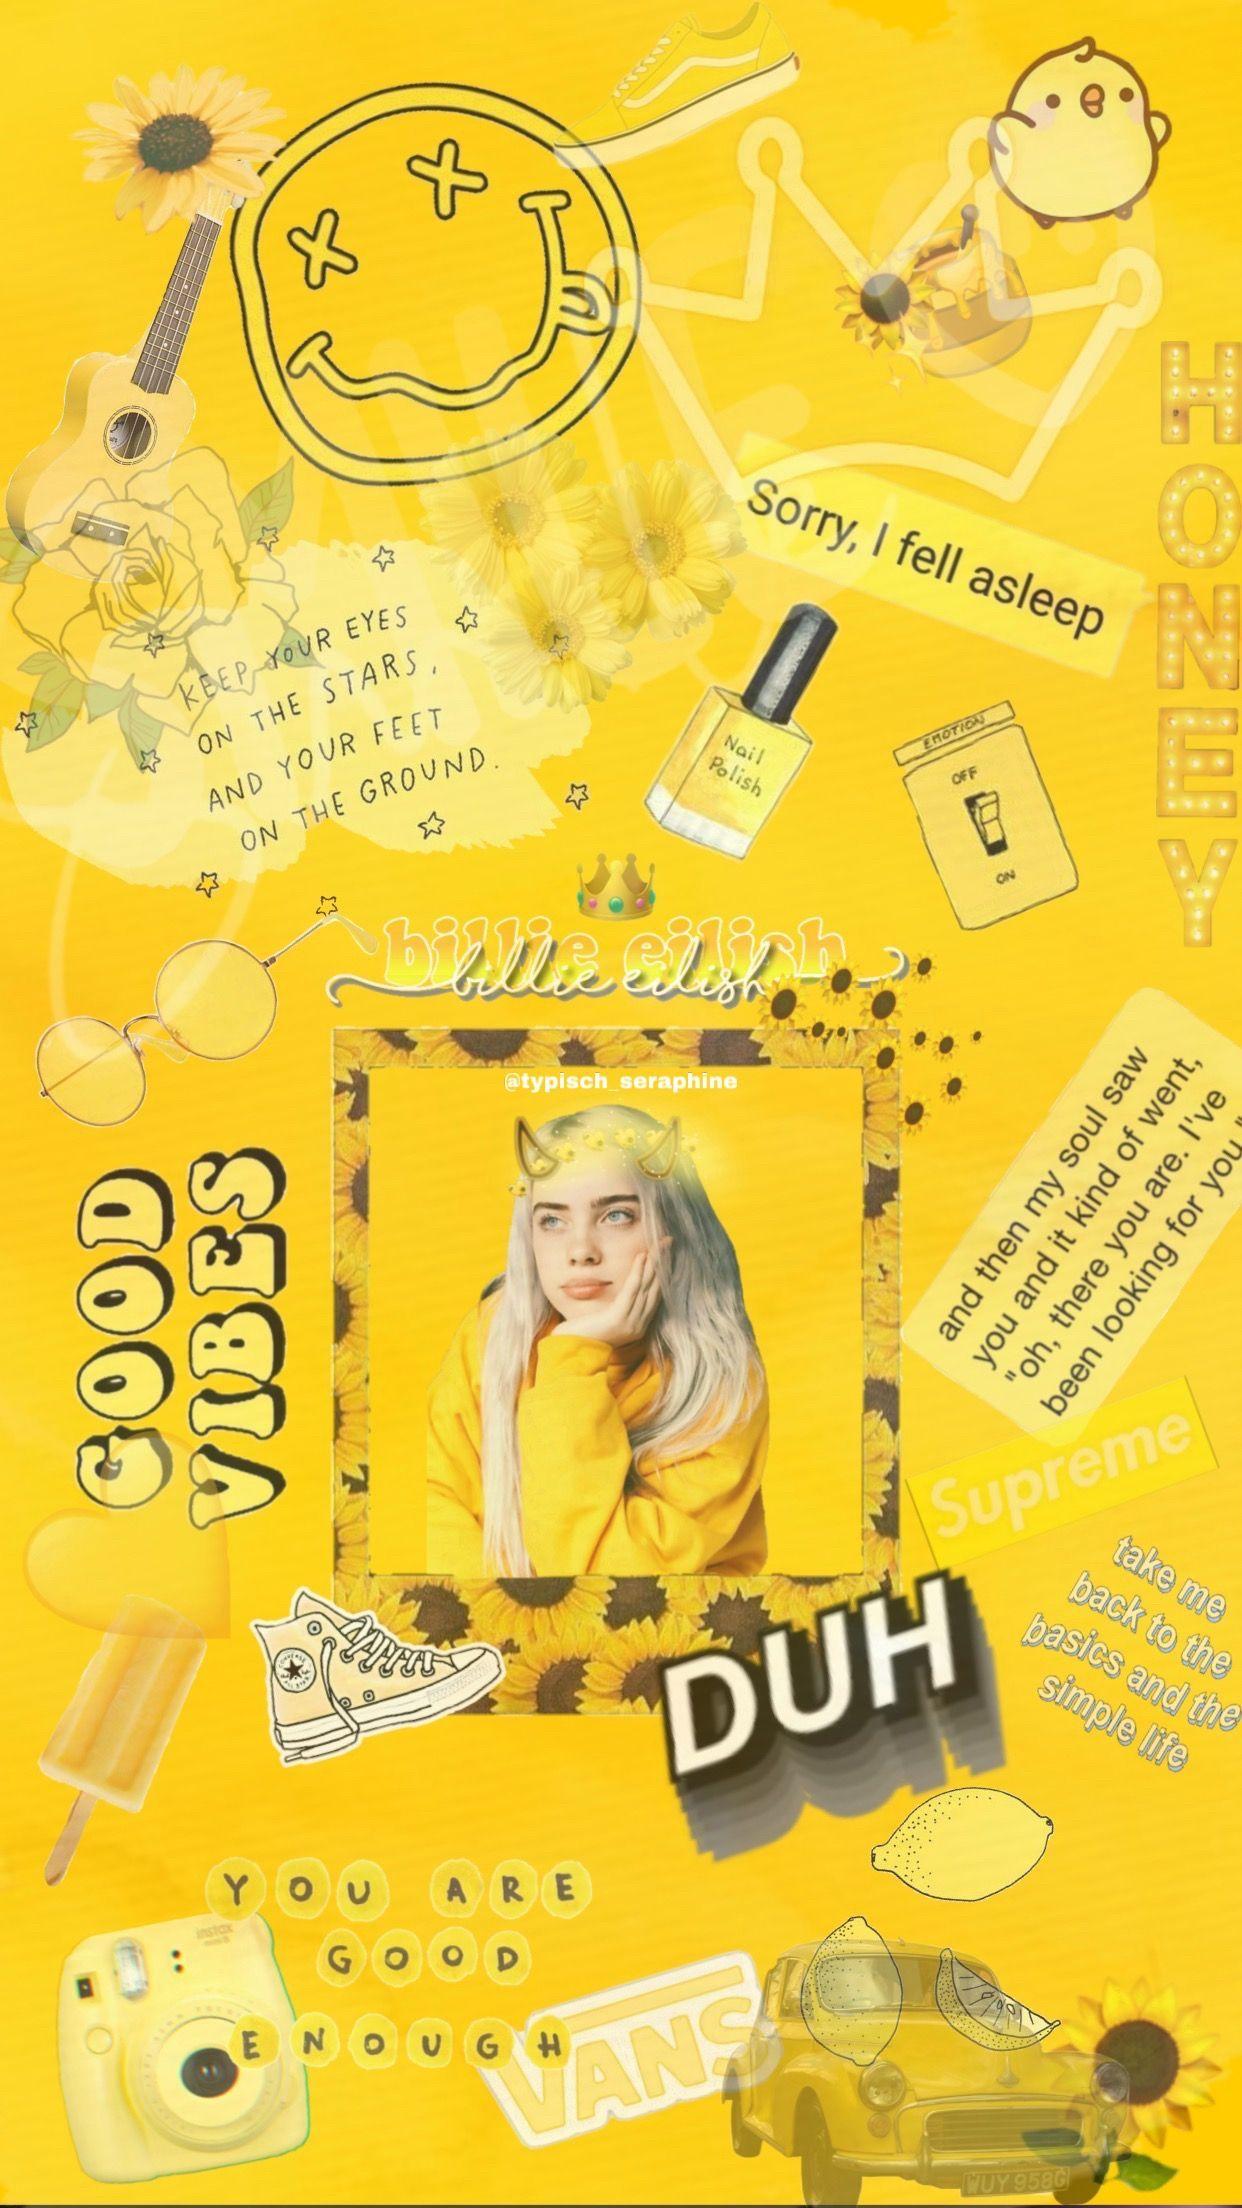 iPhone Xr Wallpaper yellow aesthetic billie eilish ️ in